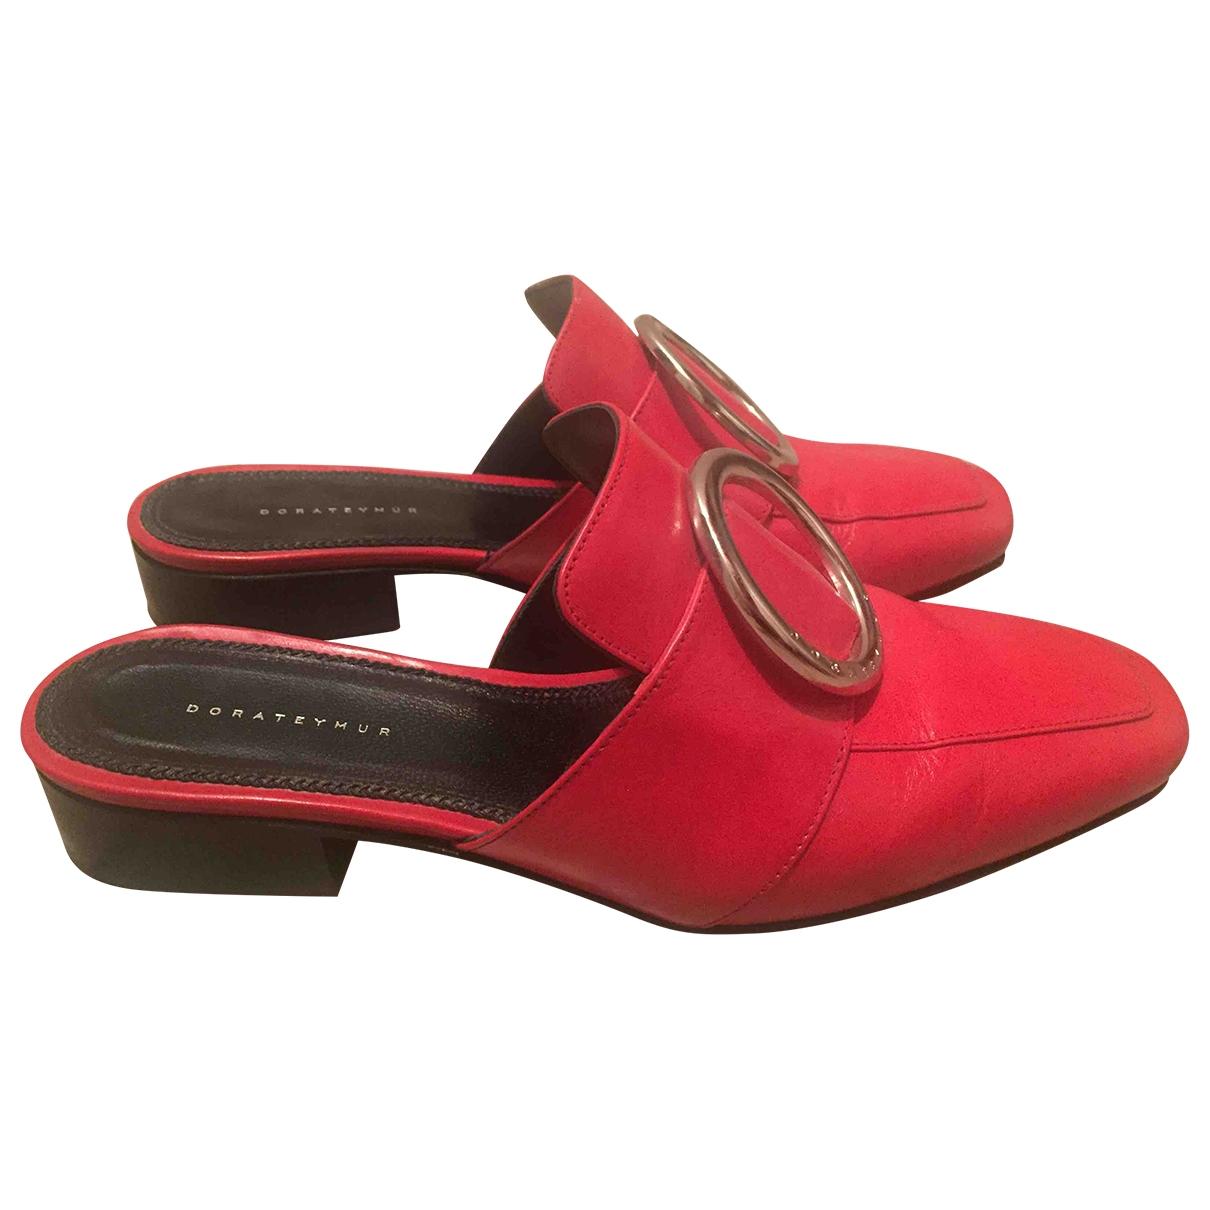 Dorateymur \N Red Leather Sandals for Women 37 EU